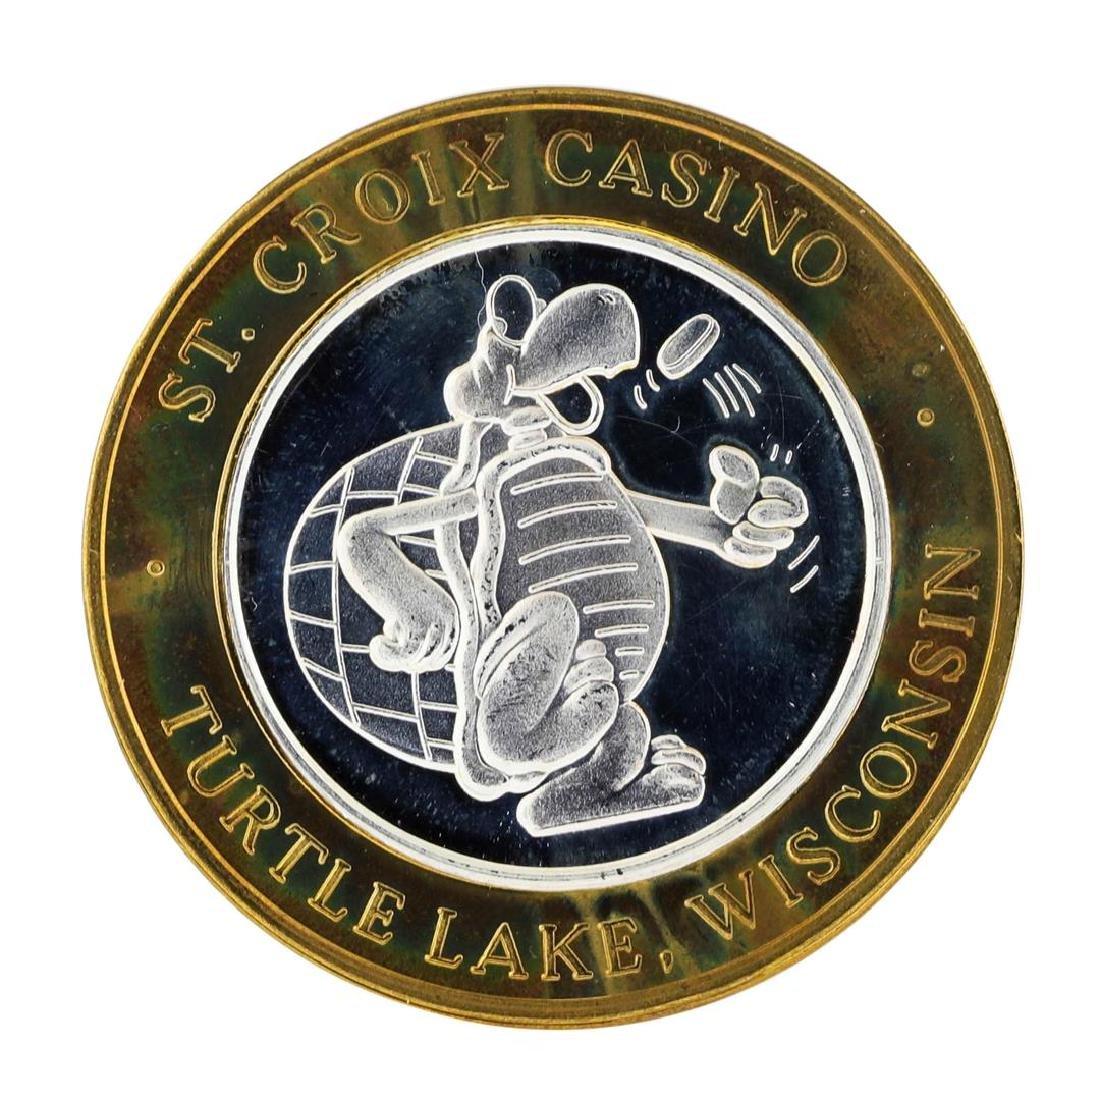 .999 Silver St. Croix Casino Turtle Lake, Wisconsin $10